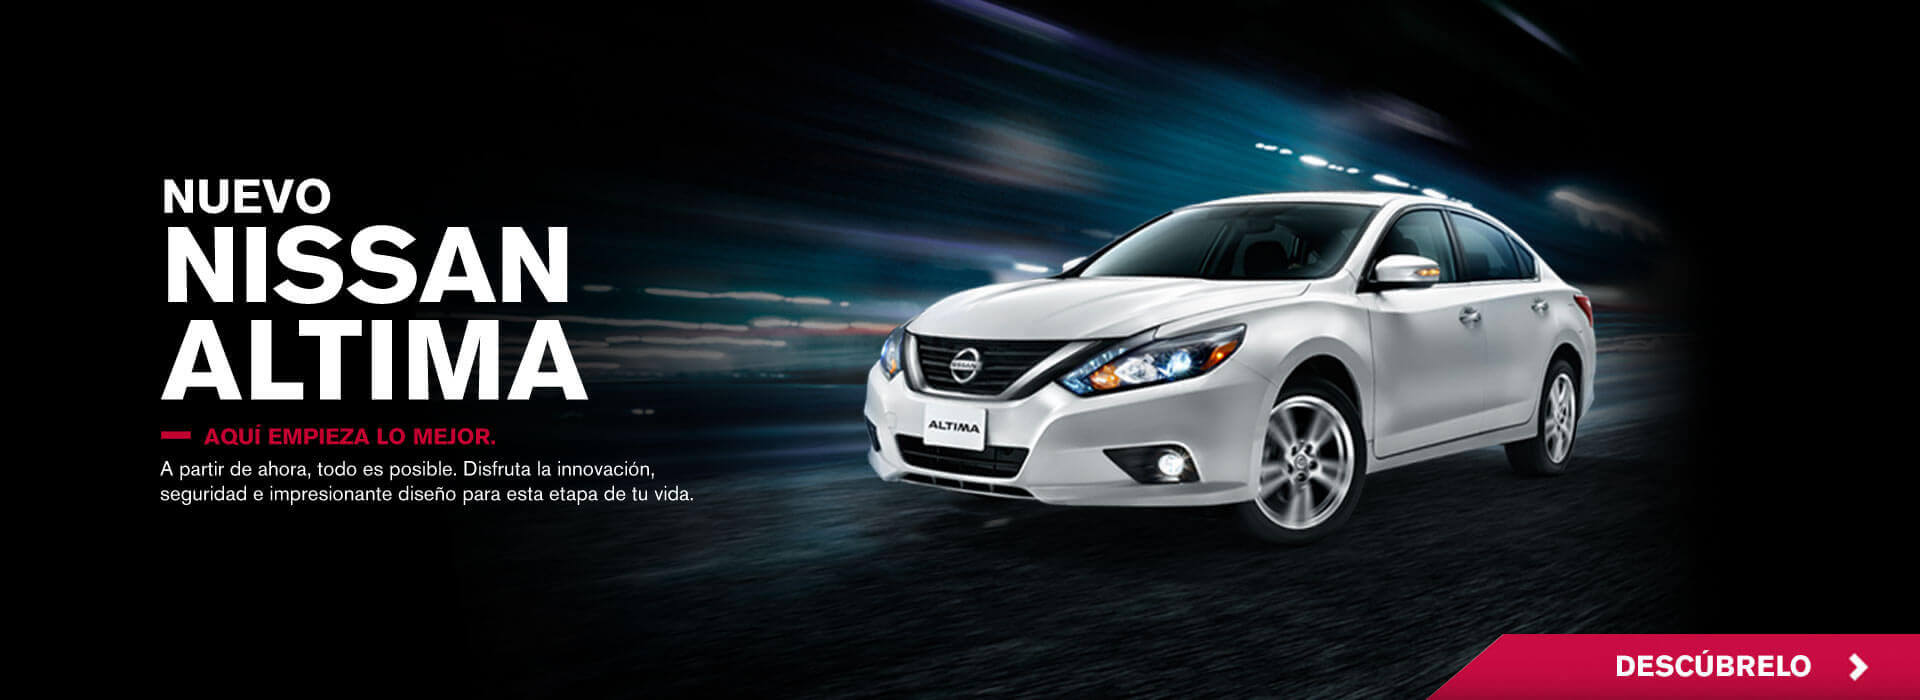 Nuevo Nissan Altima